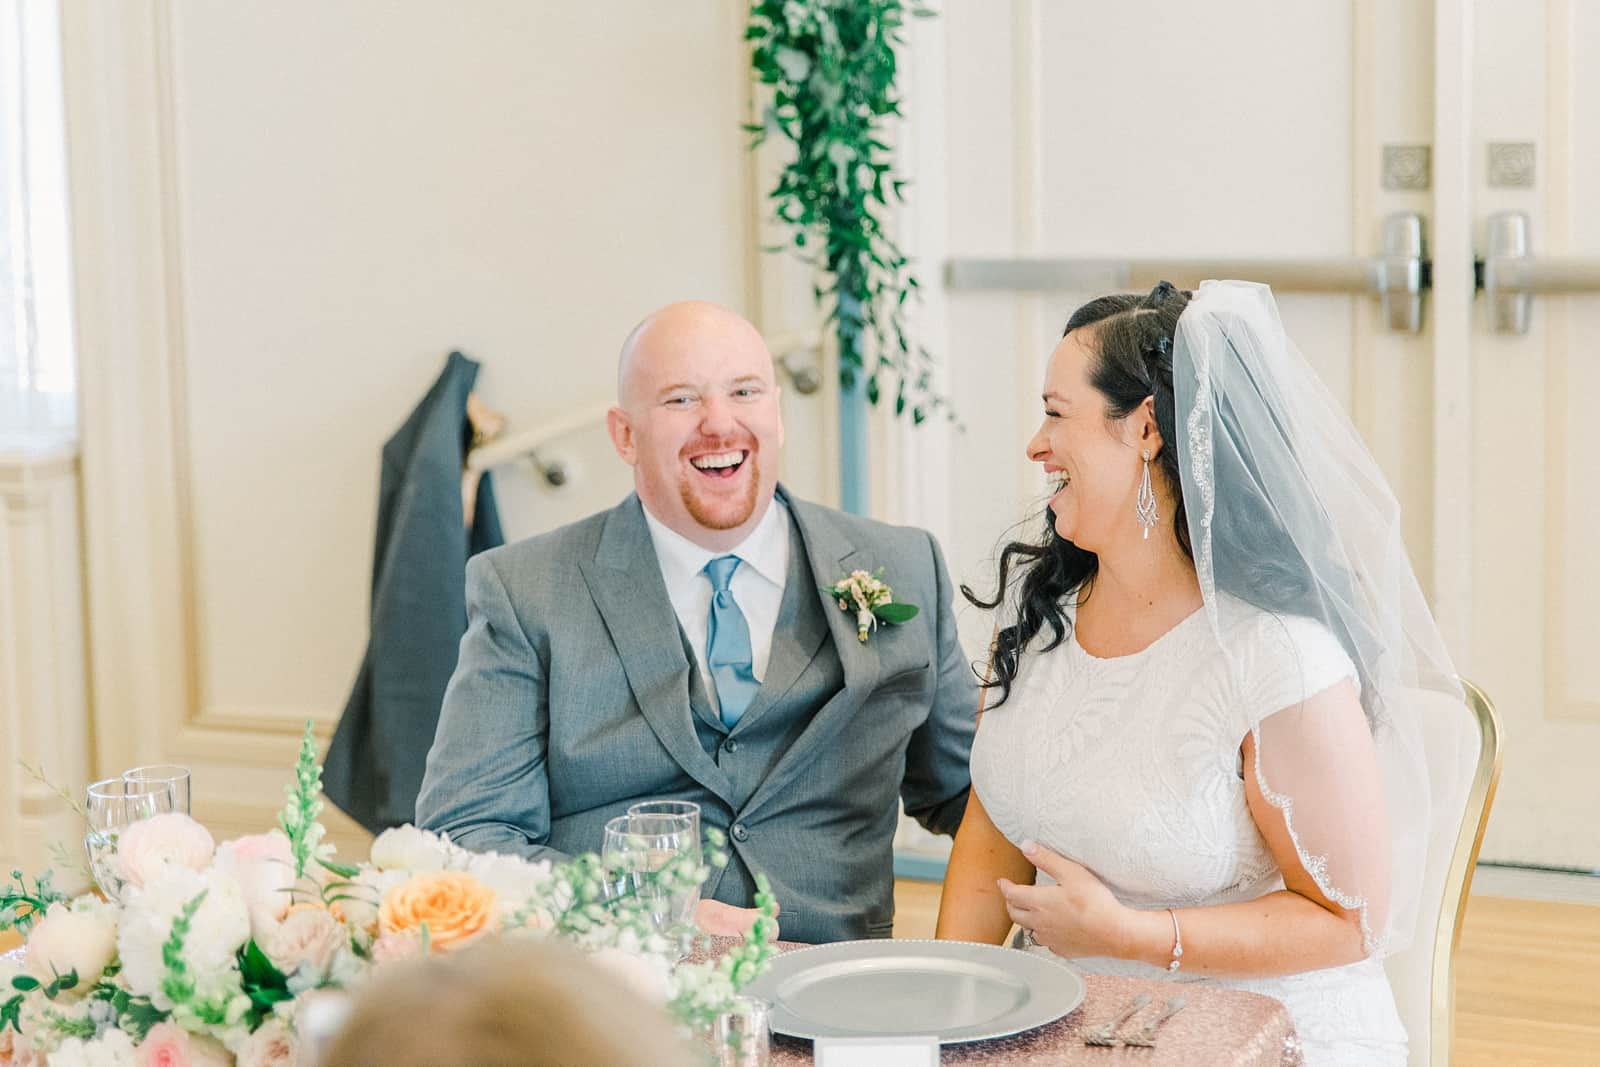 Thomas S. Monson Center Wedding, Salt Lake LDS Temple Wedding, Utah wedding photography, reception decor, sequin tablecloth, pink and white wedding flowers tablescape centerpiece